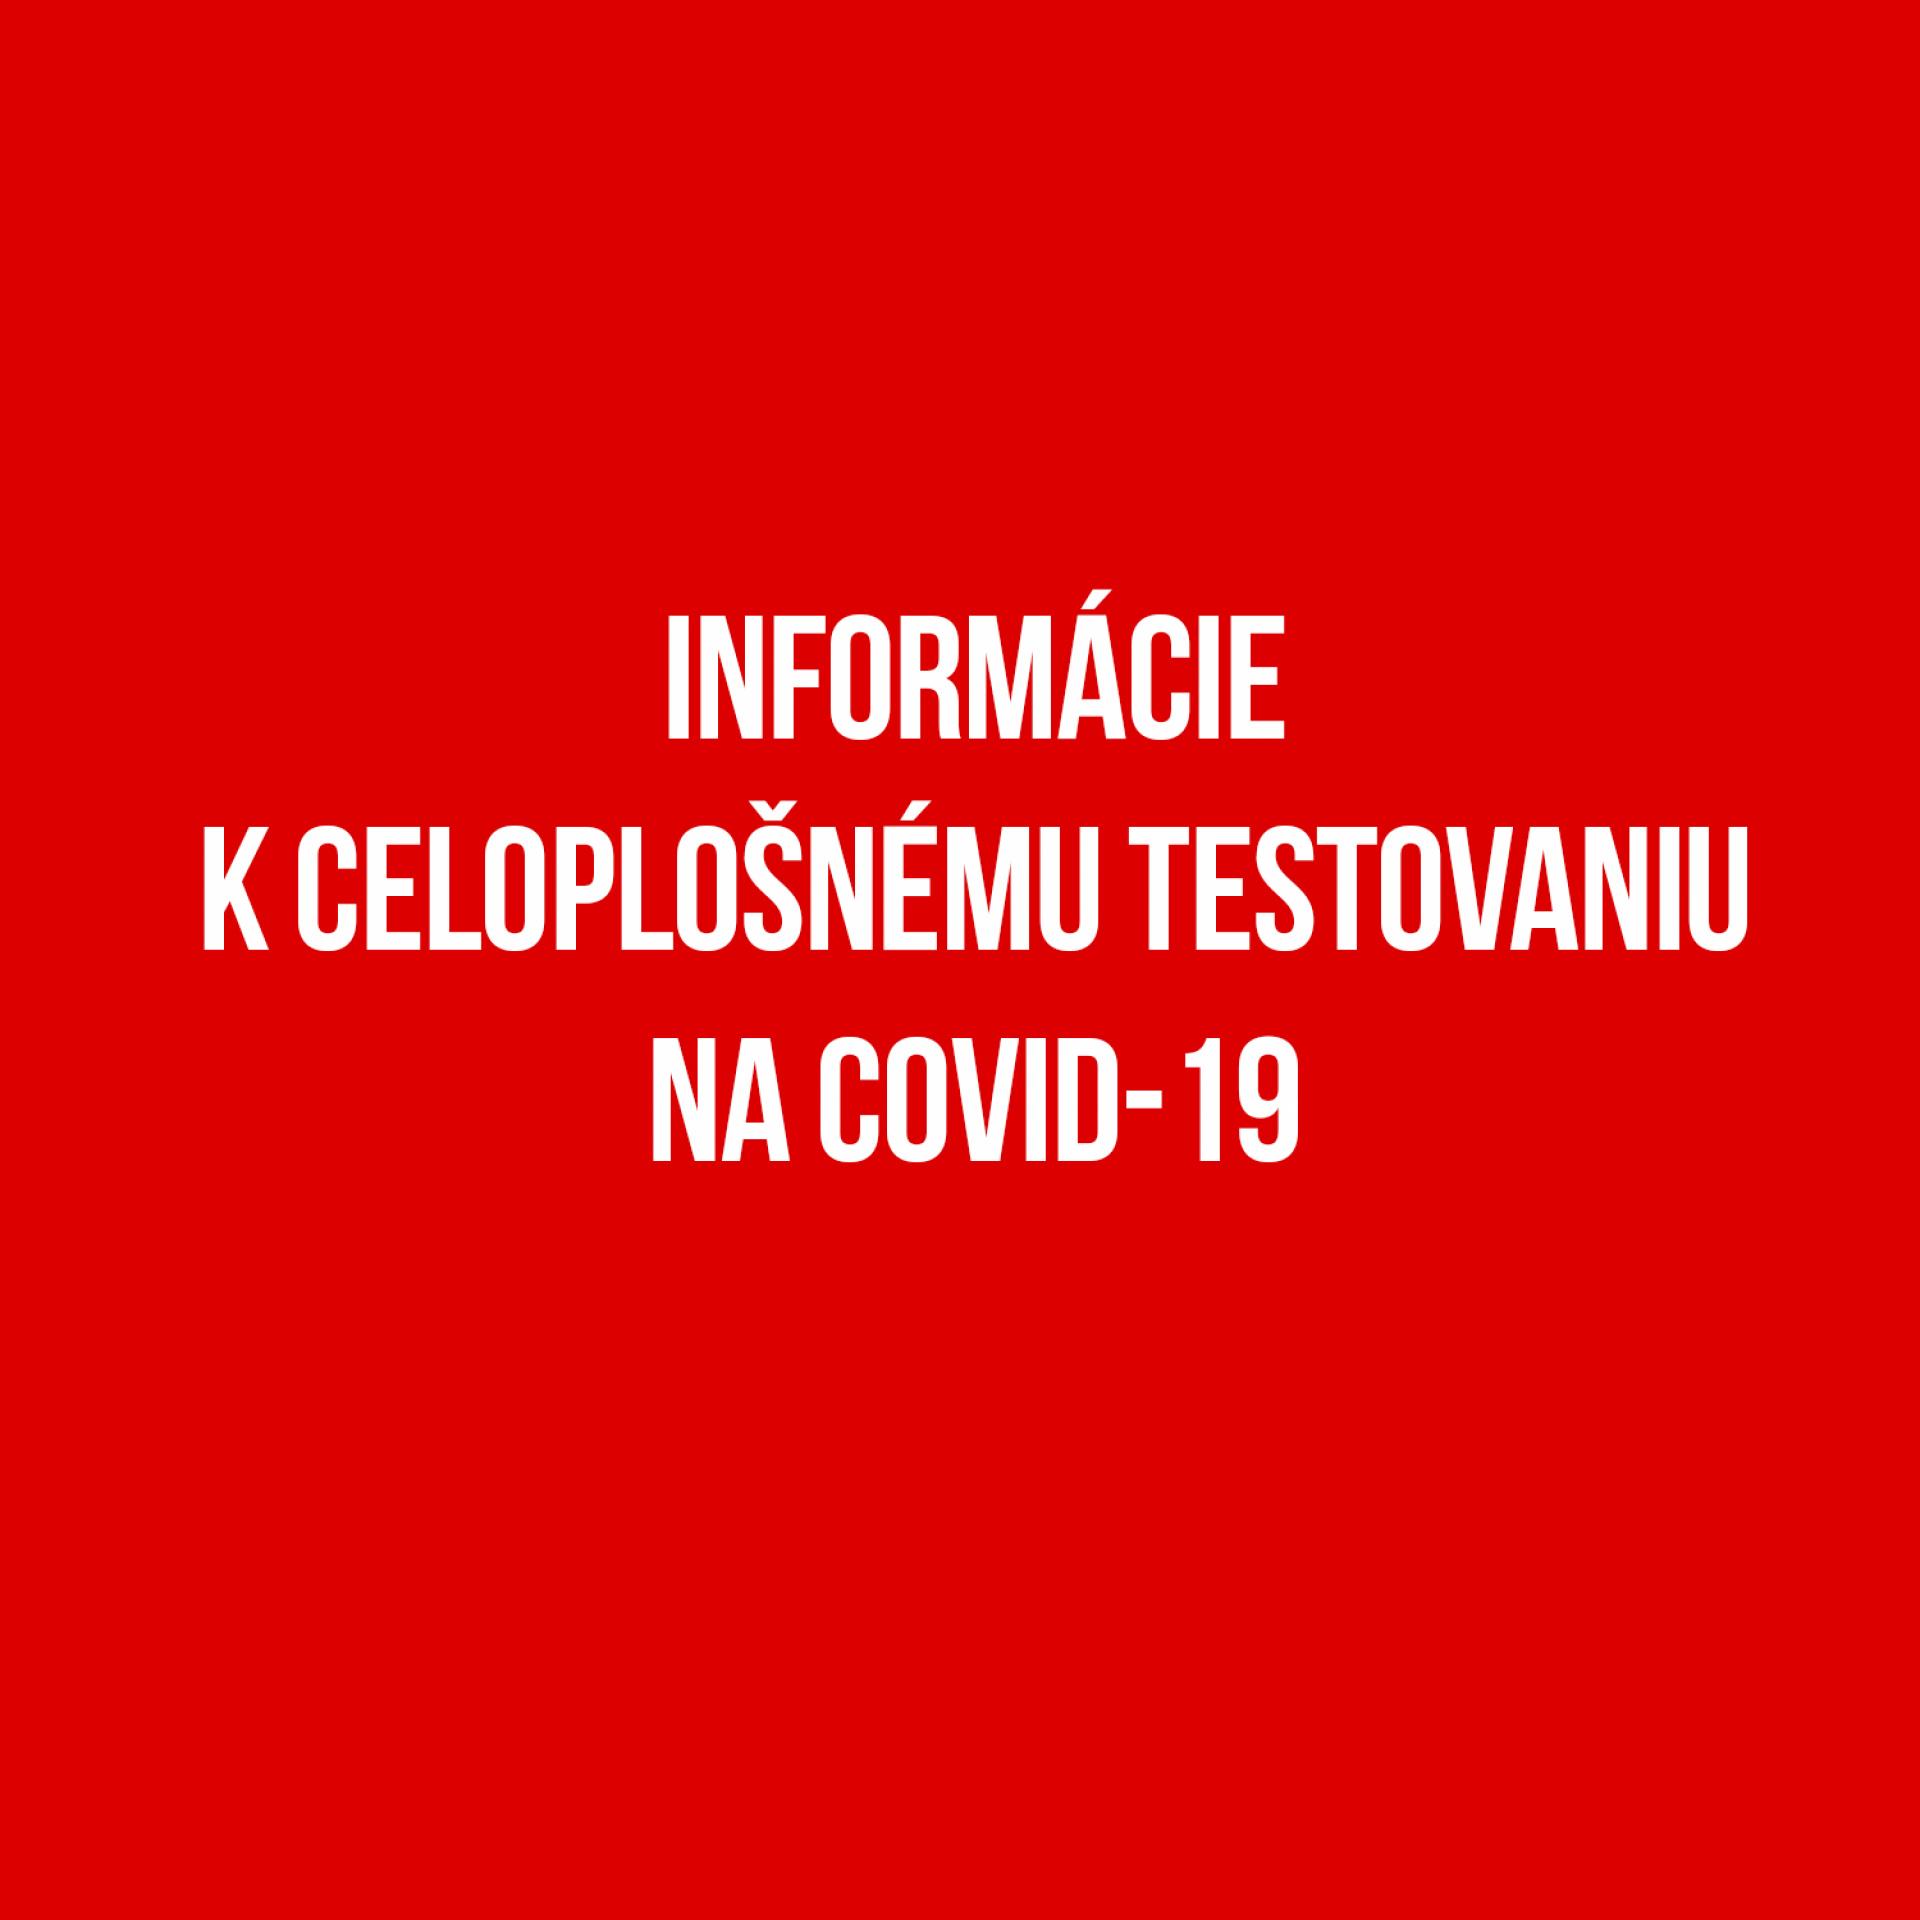 korona_testovanie